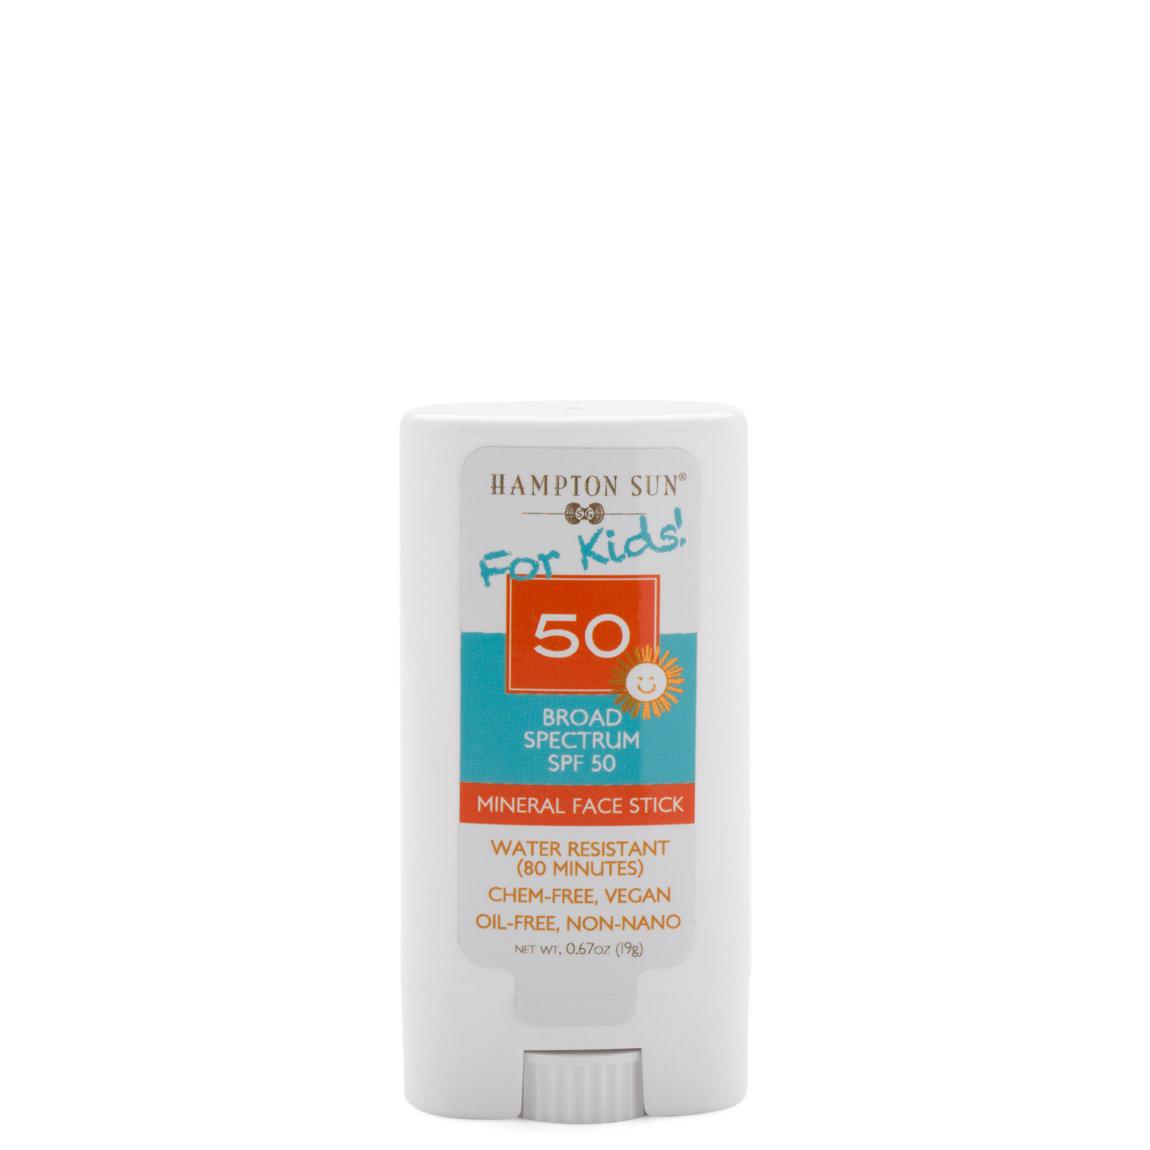 Hampton Sun SPF 50 Kids Mineral Face Stick product swatch.